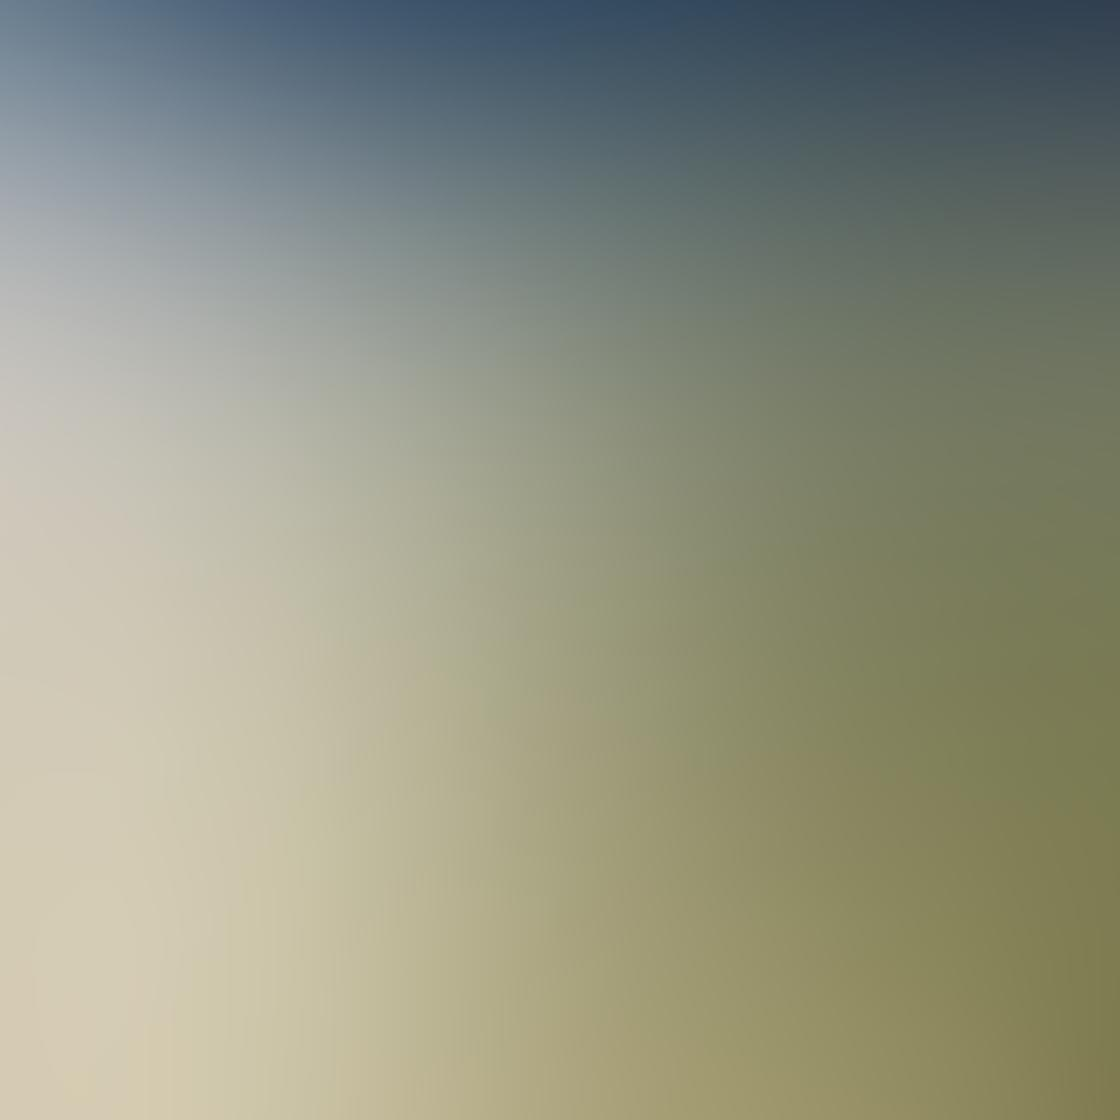 Minimalist iPhone Photography 12